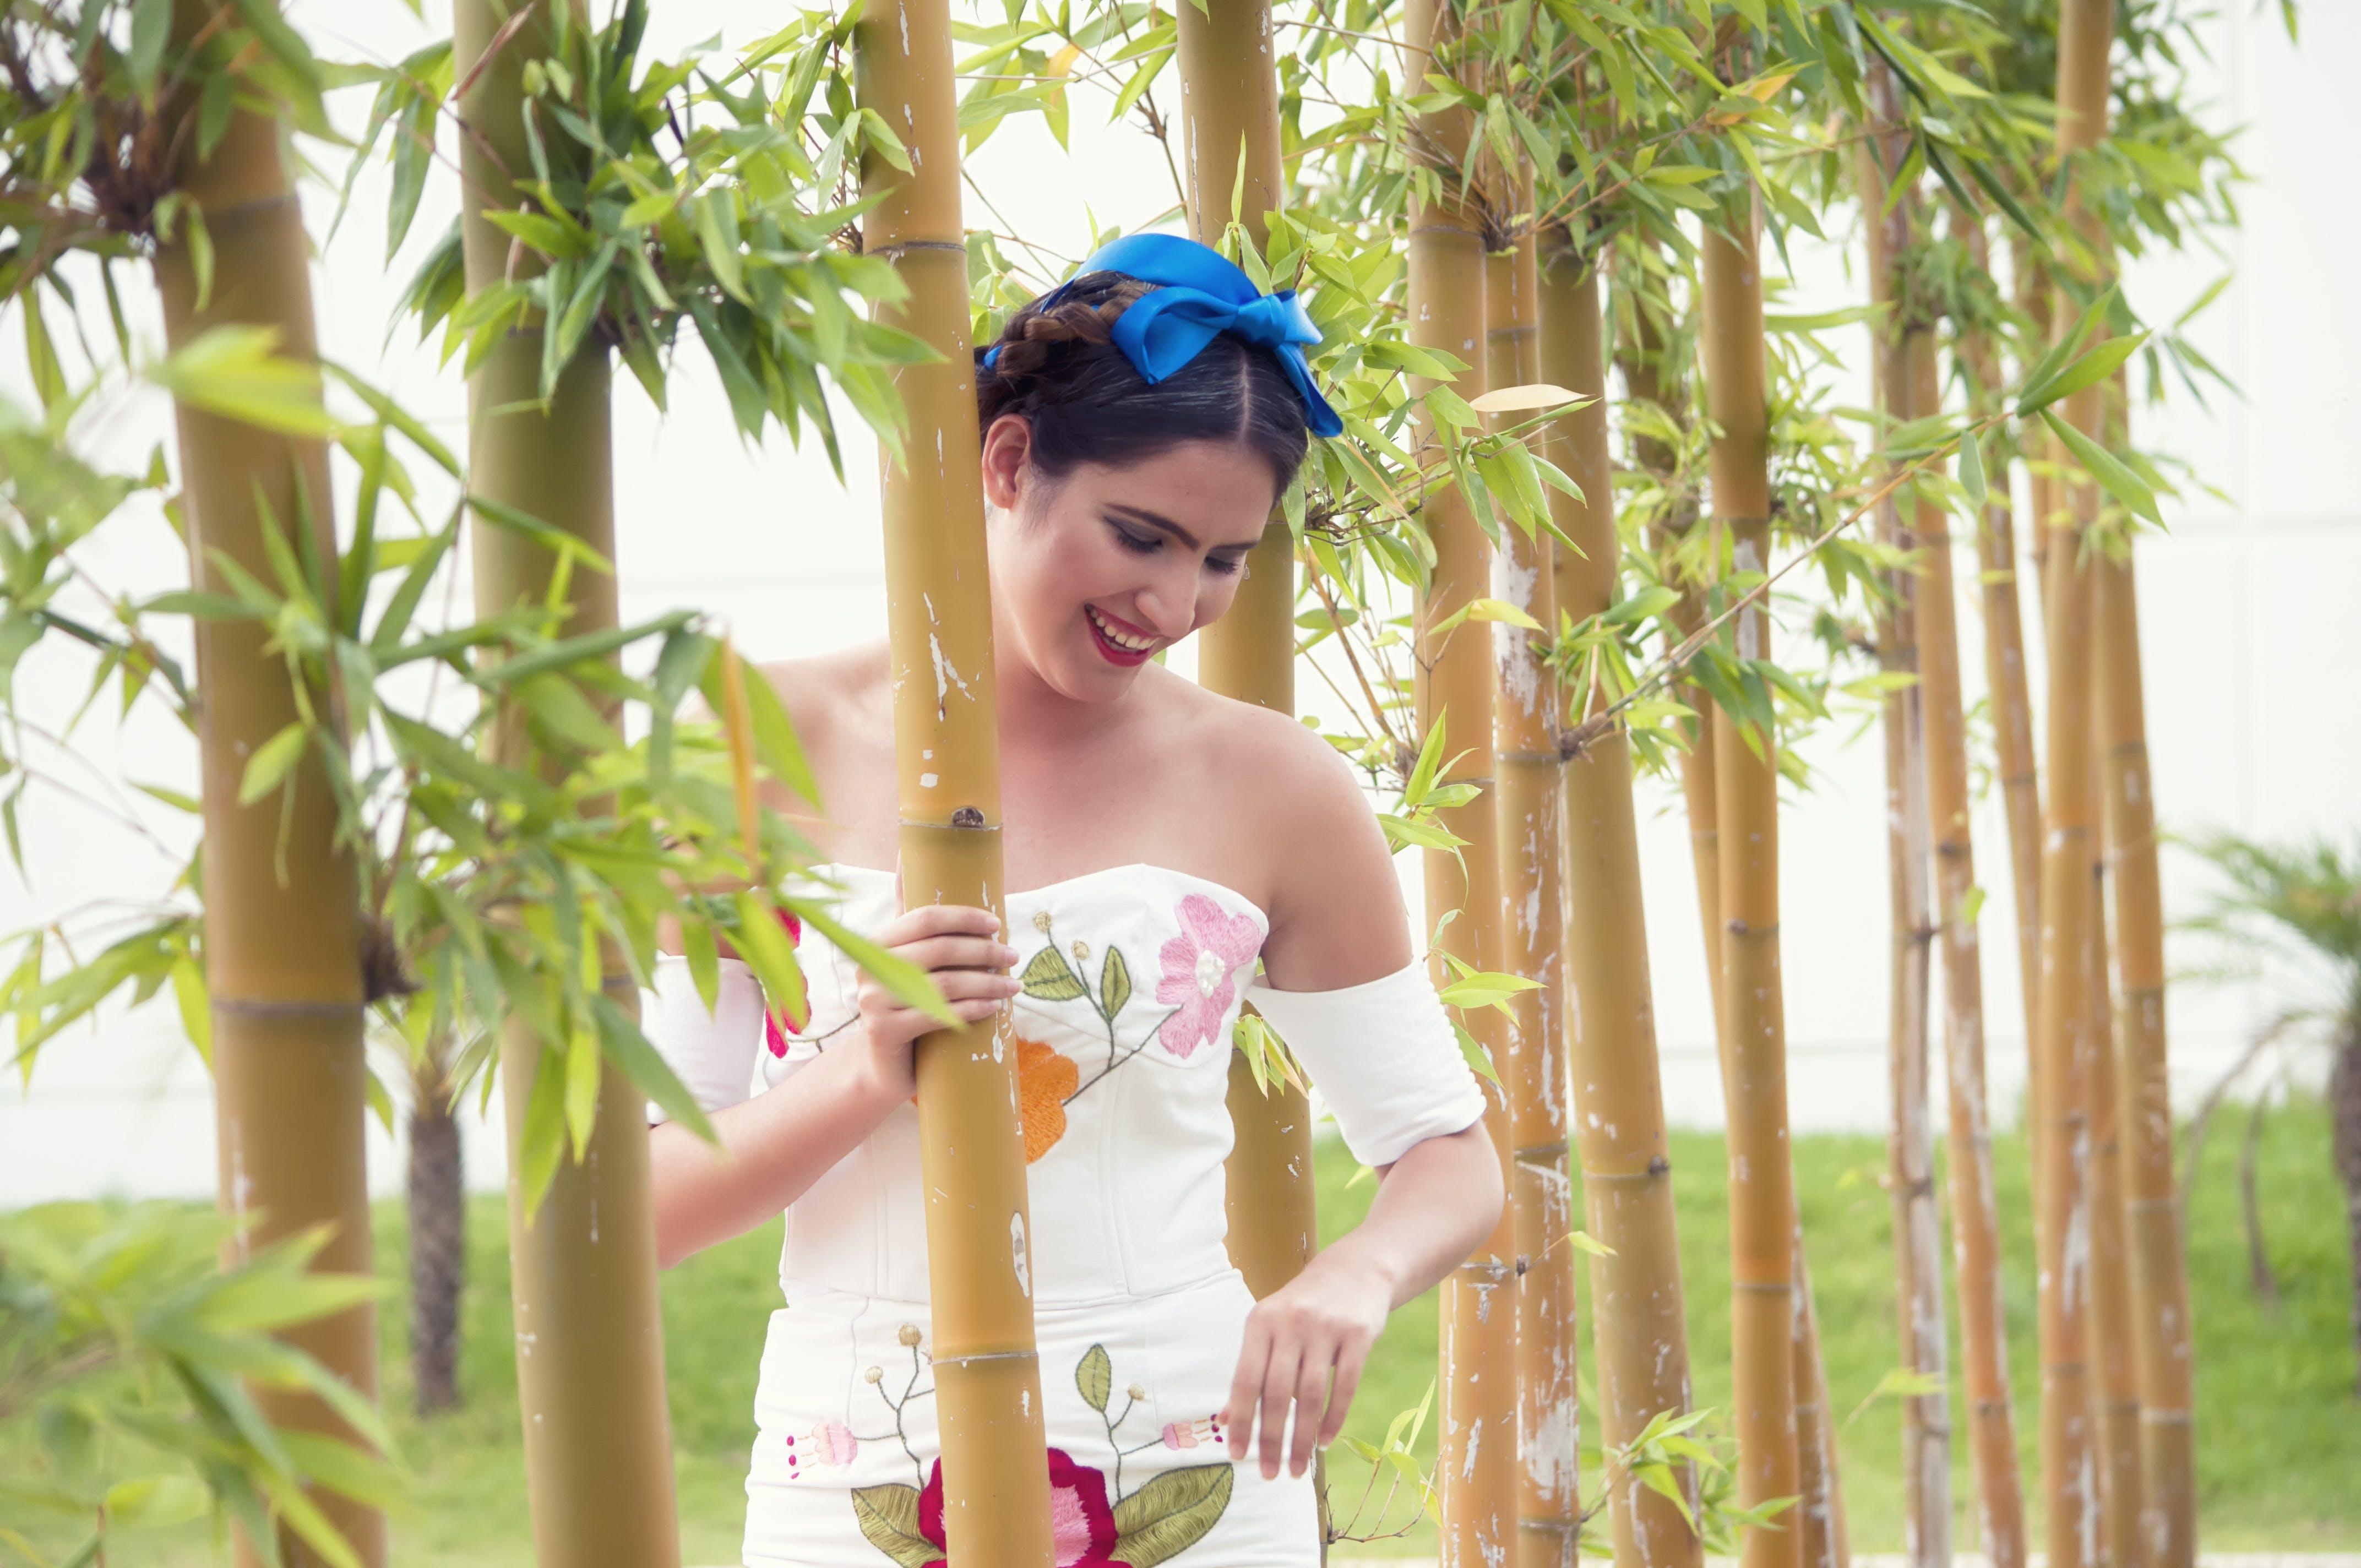 Woman Behind Bamboo Grass